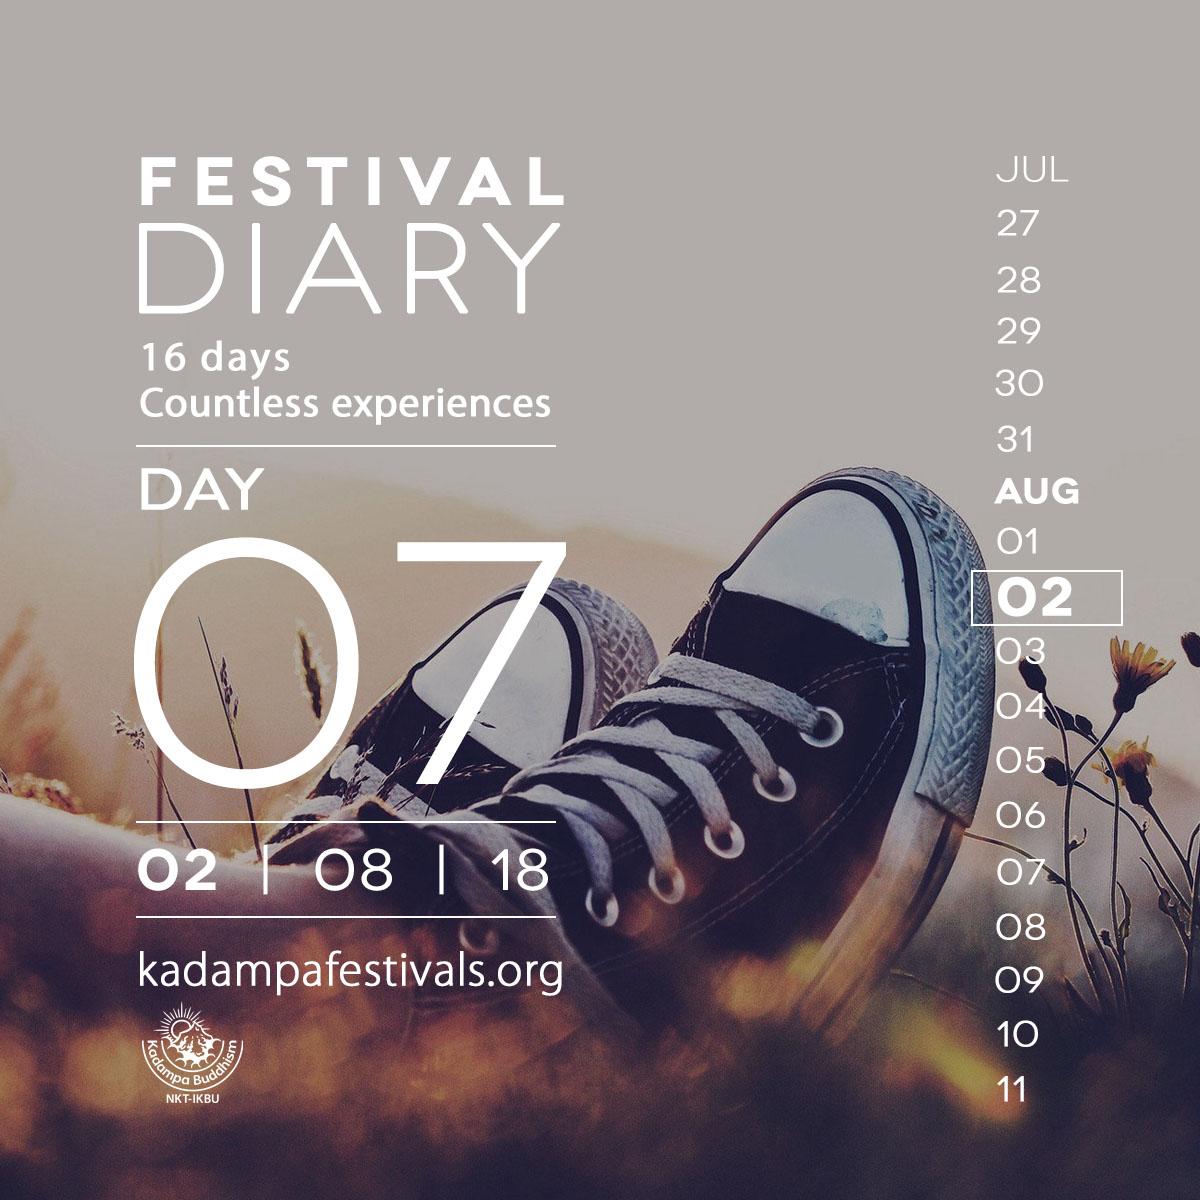 2018-07-26-festival diary-07-m